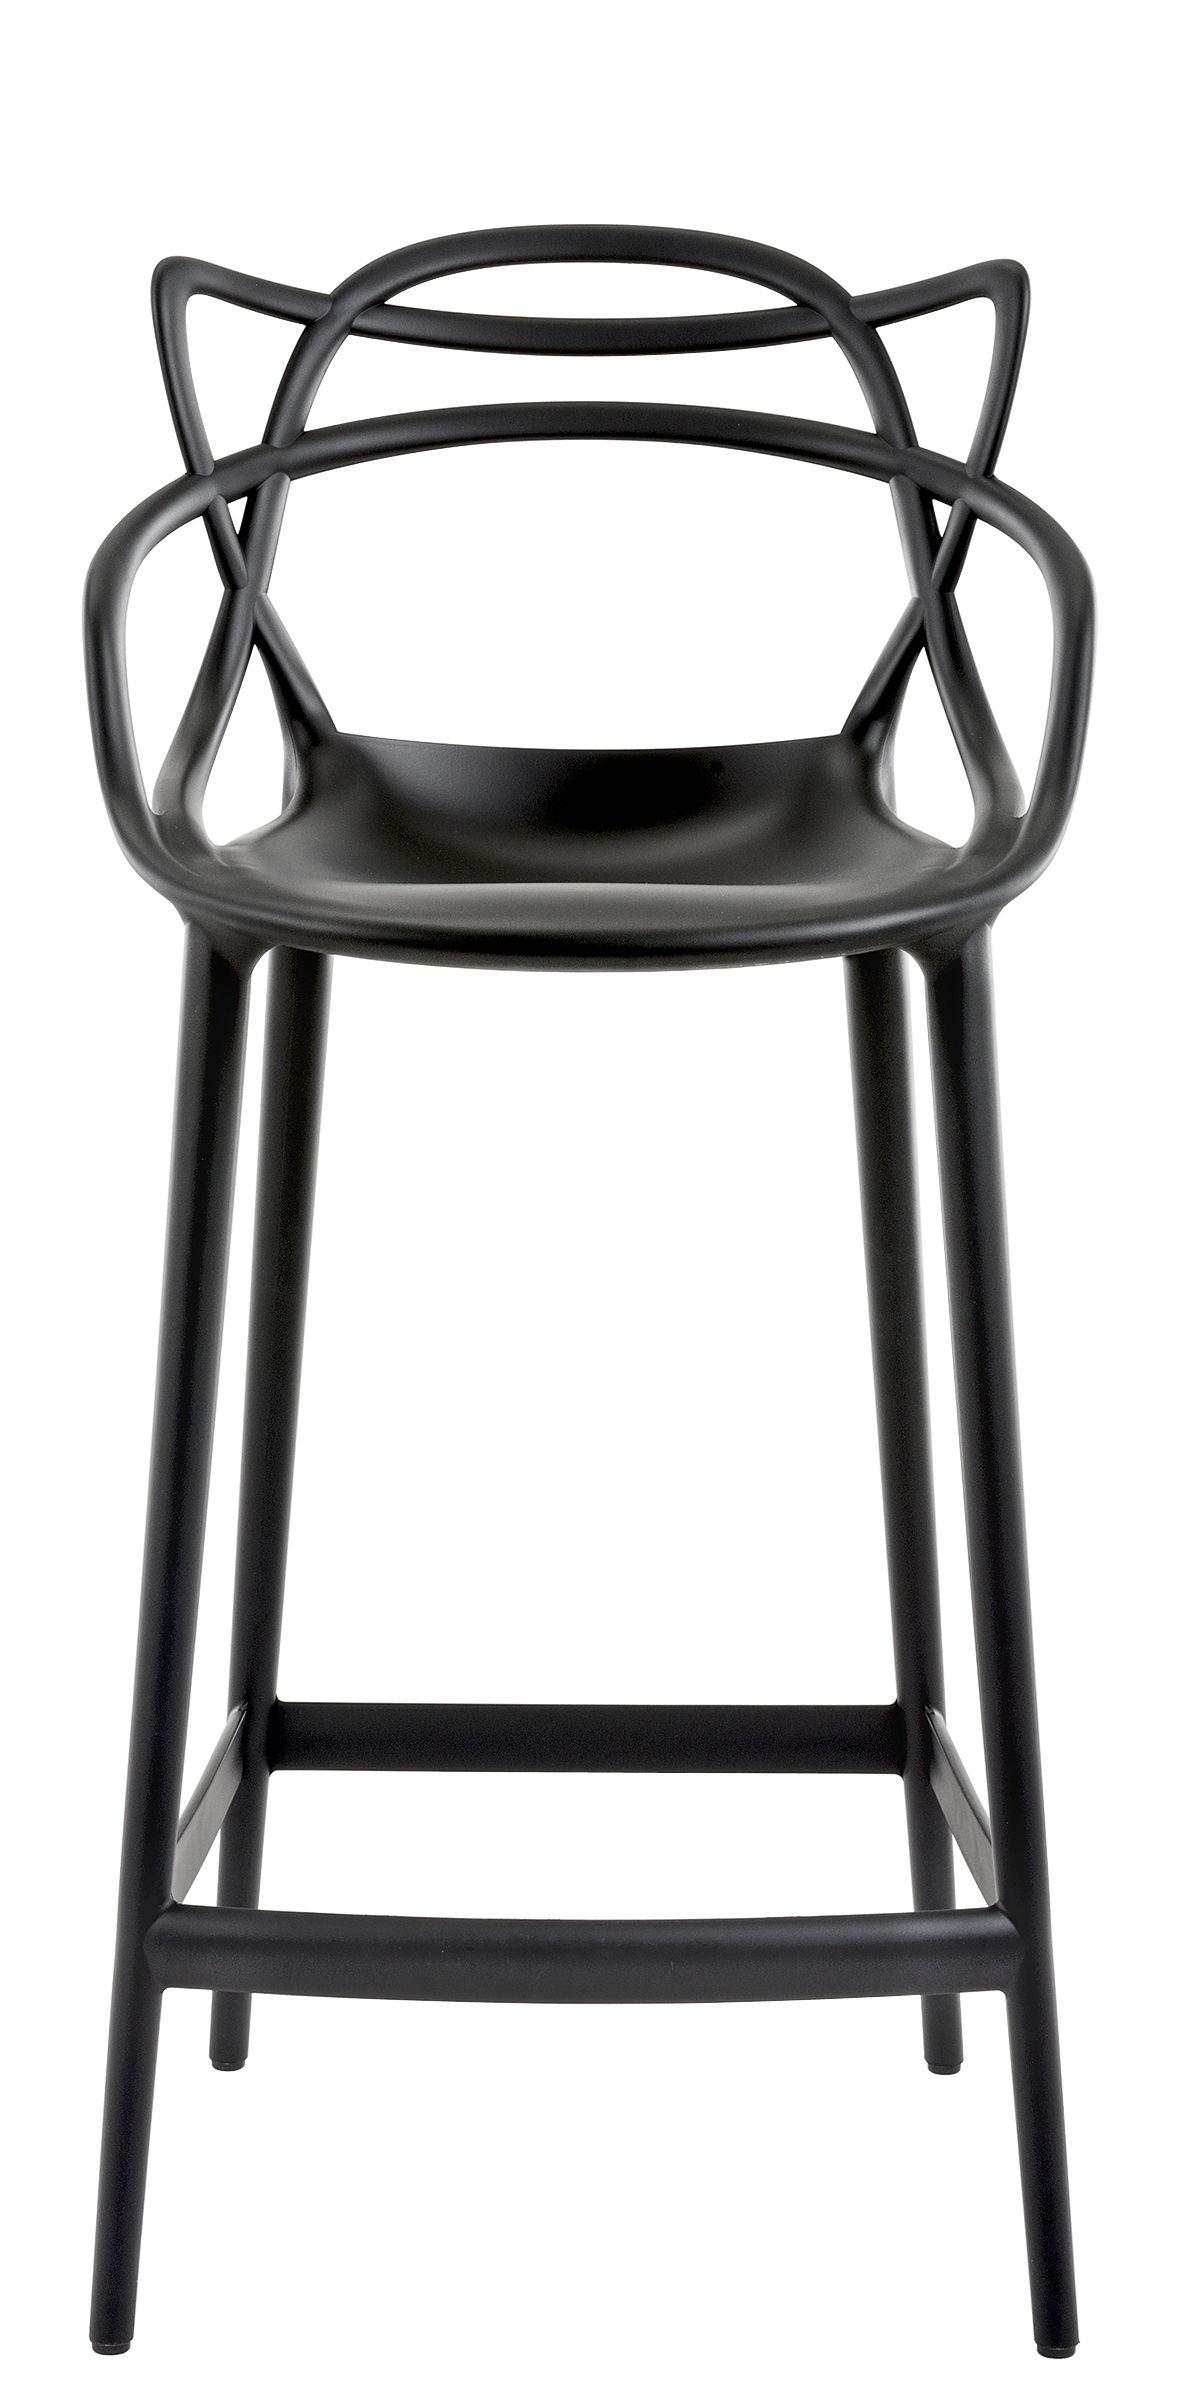 Furniture - Bar Stools - Masters Bar chair - H 65 cm - Polypropylen by Kartell - Black - Polypropylene